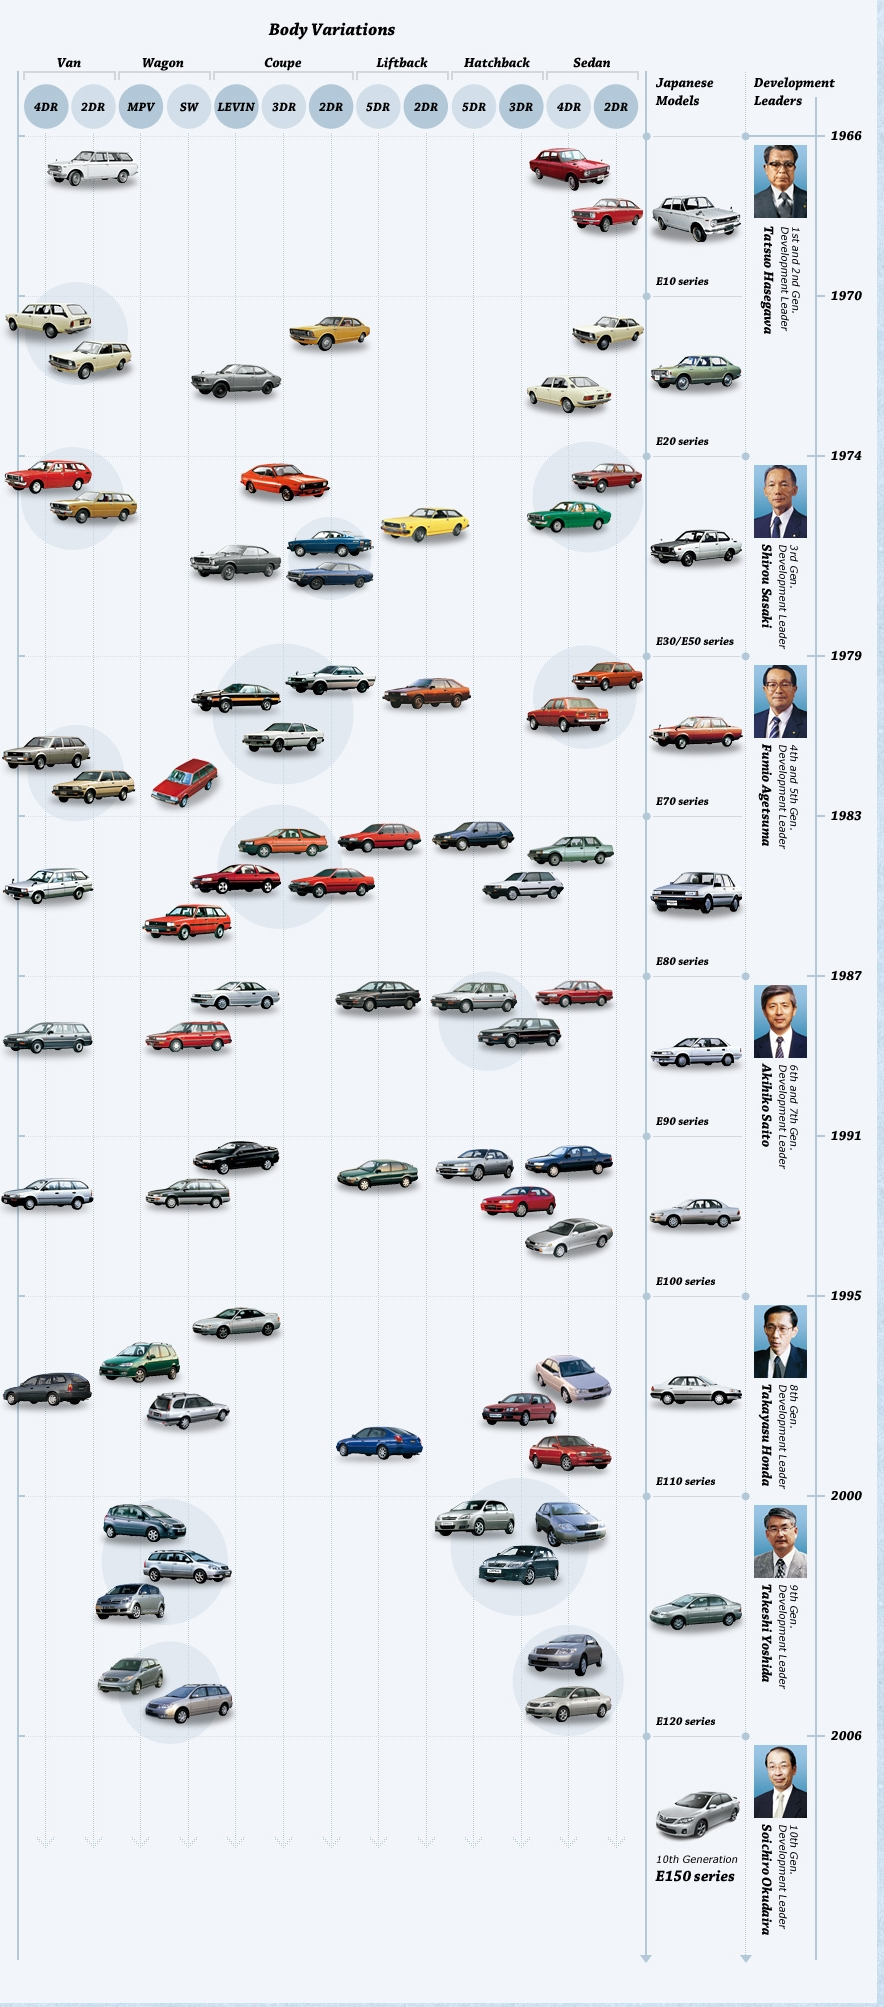 Toyota_Corolla_modelltortenet_history_timeline